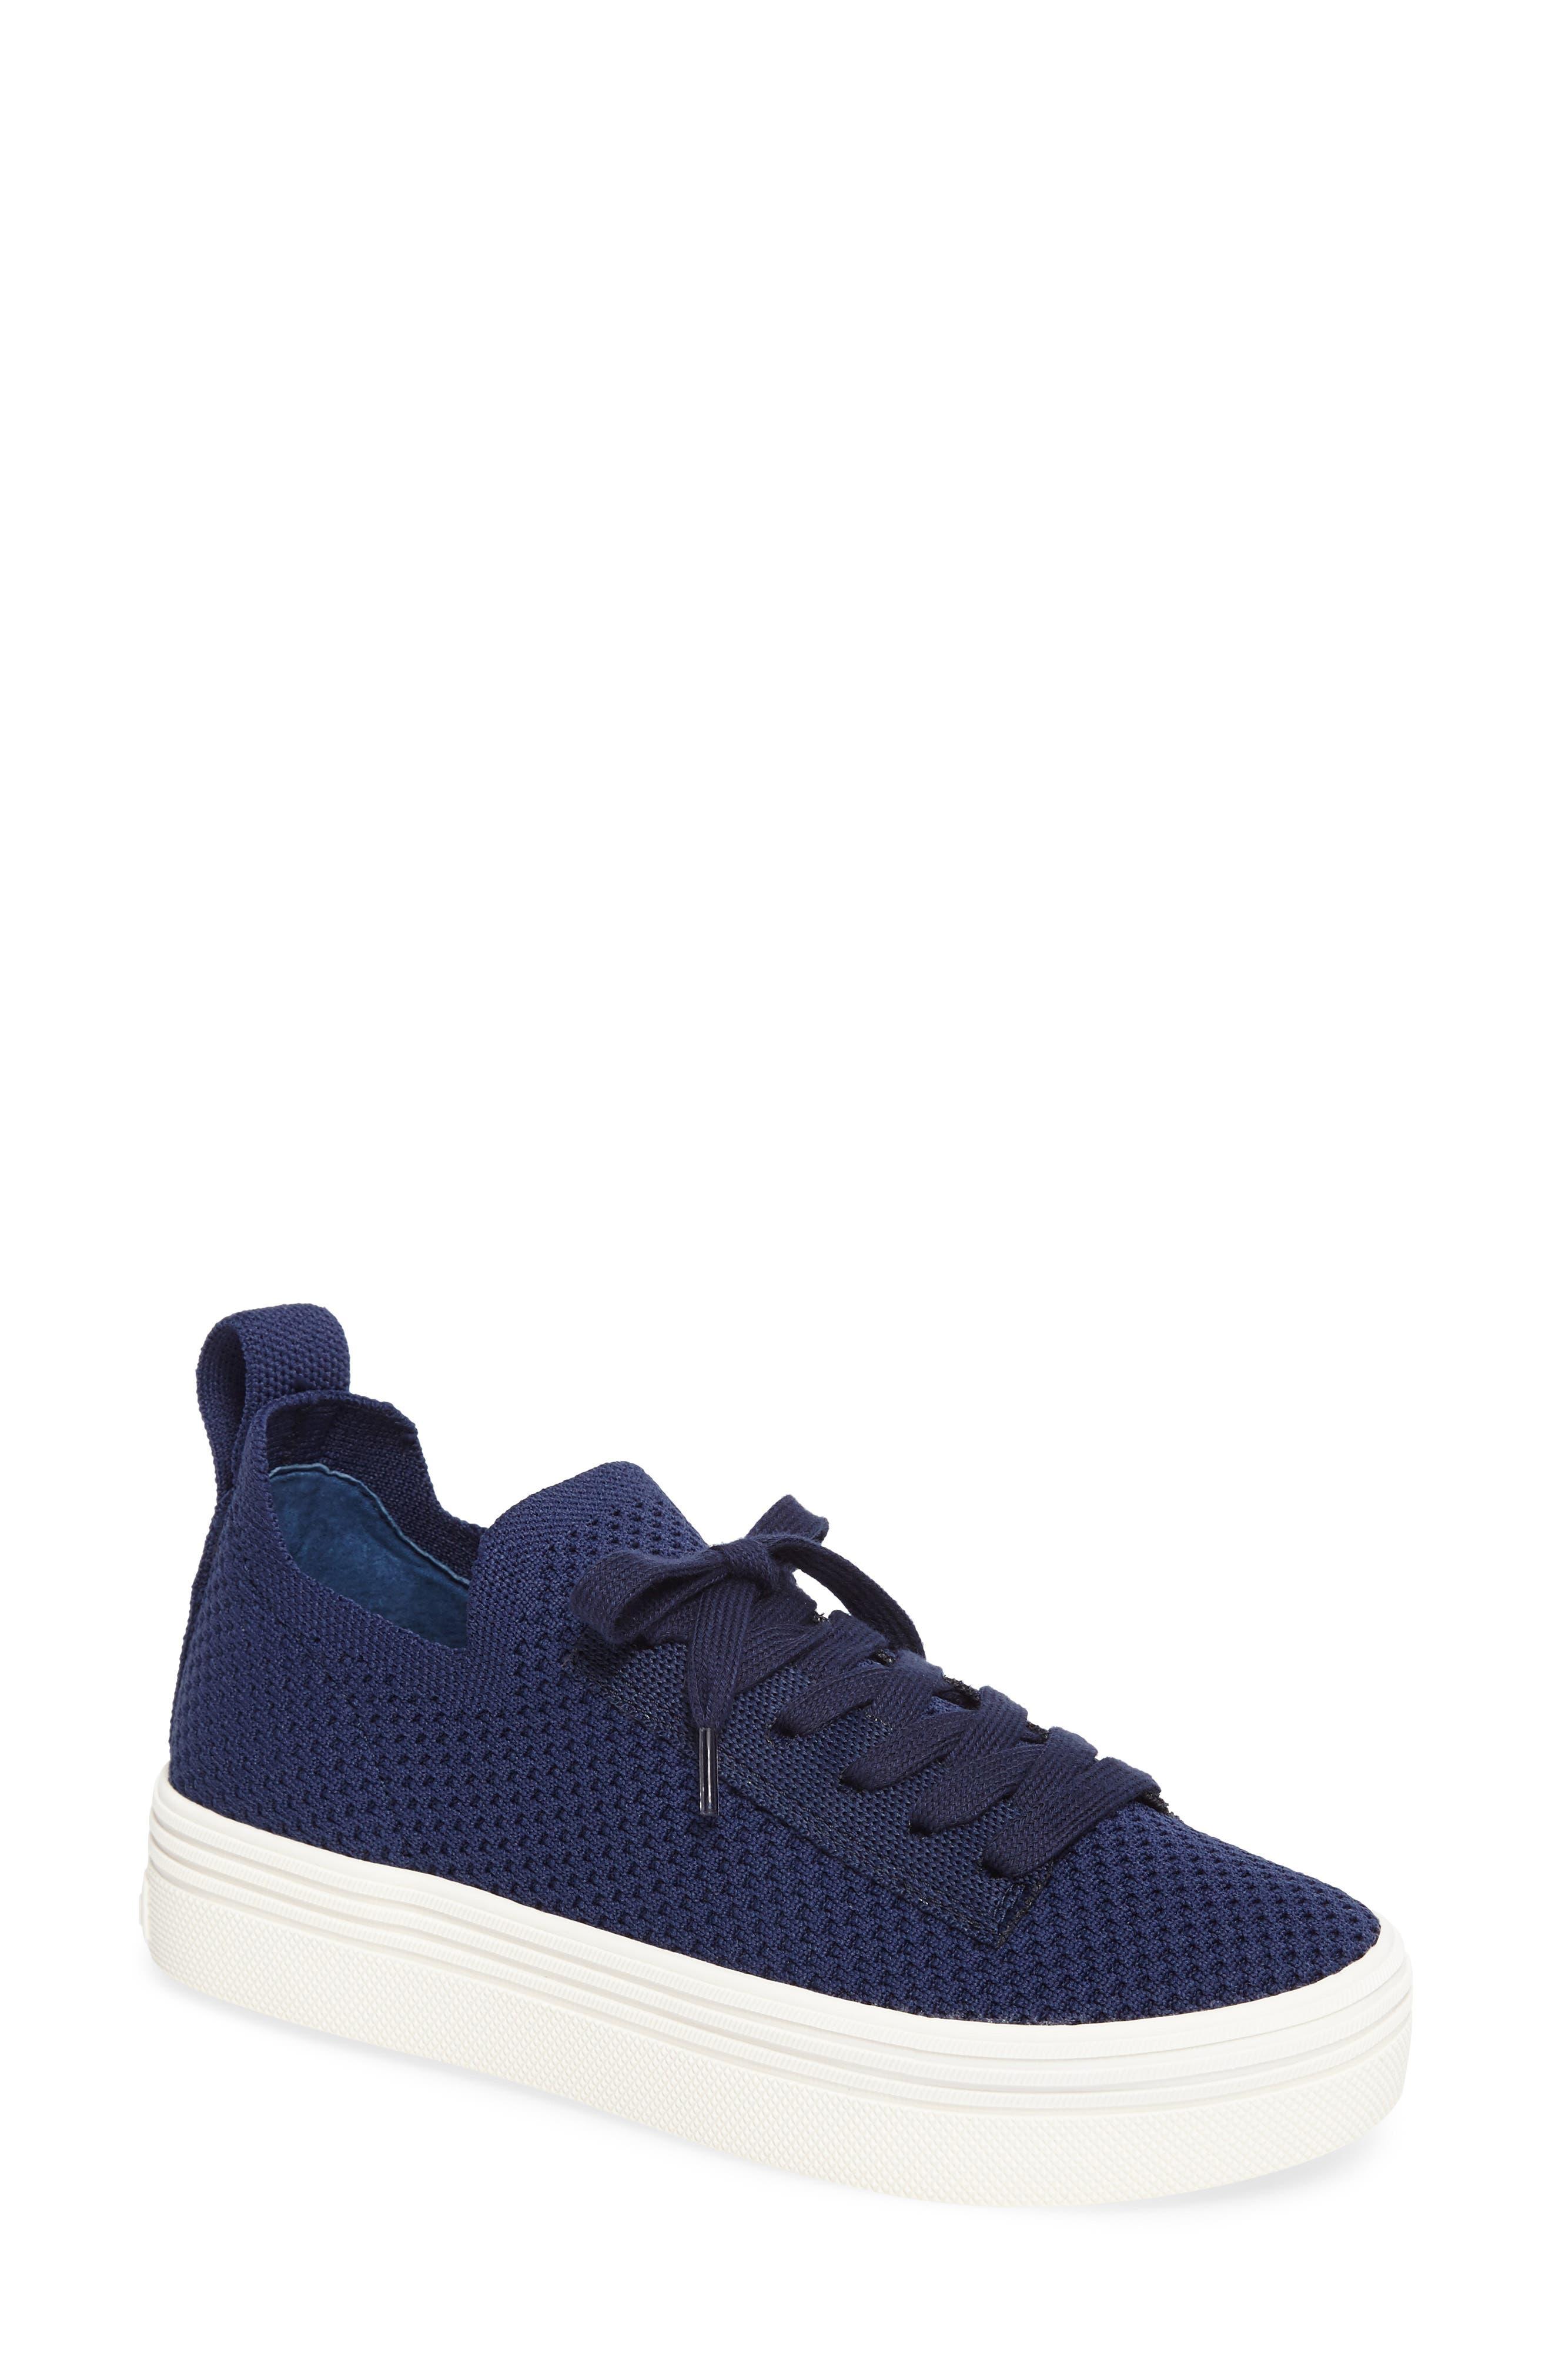 Dolce Vita Tatum Knit Platform Sneaker (Women)